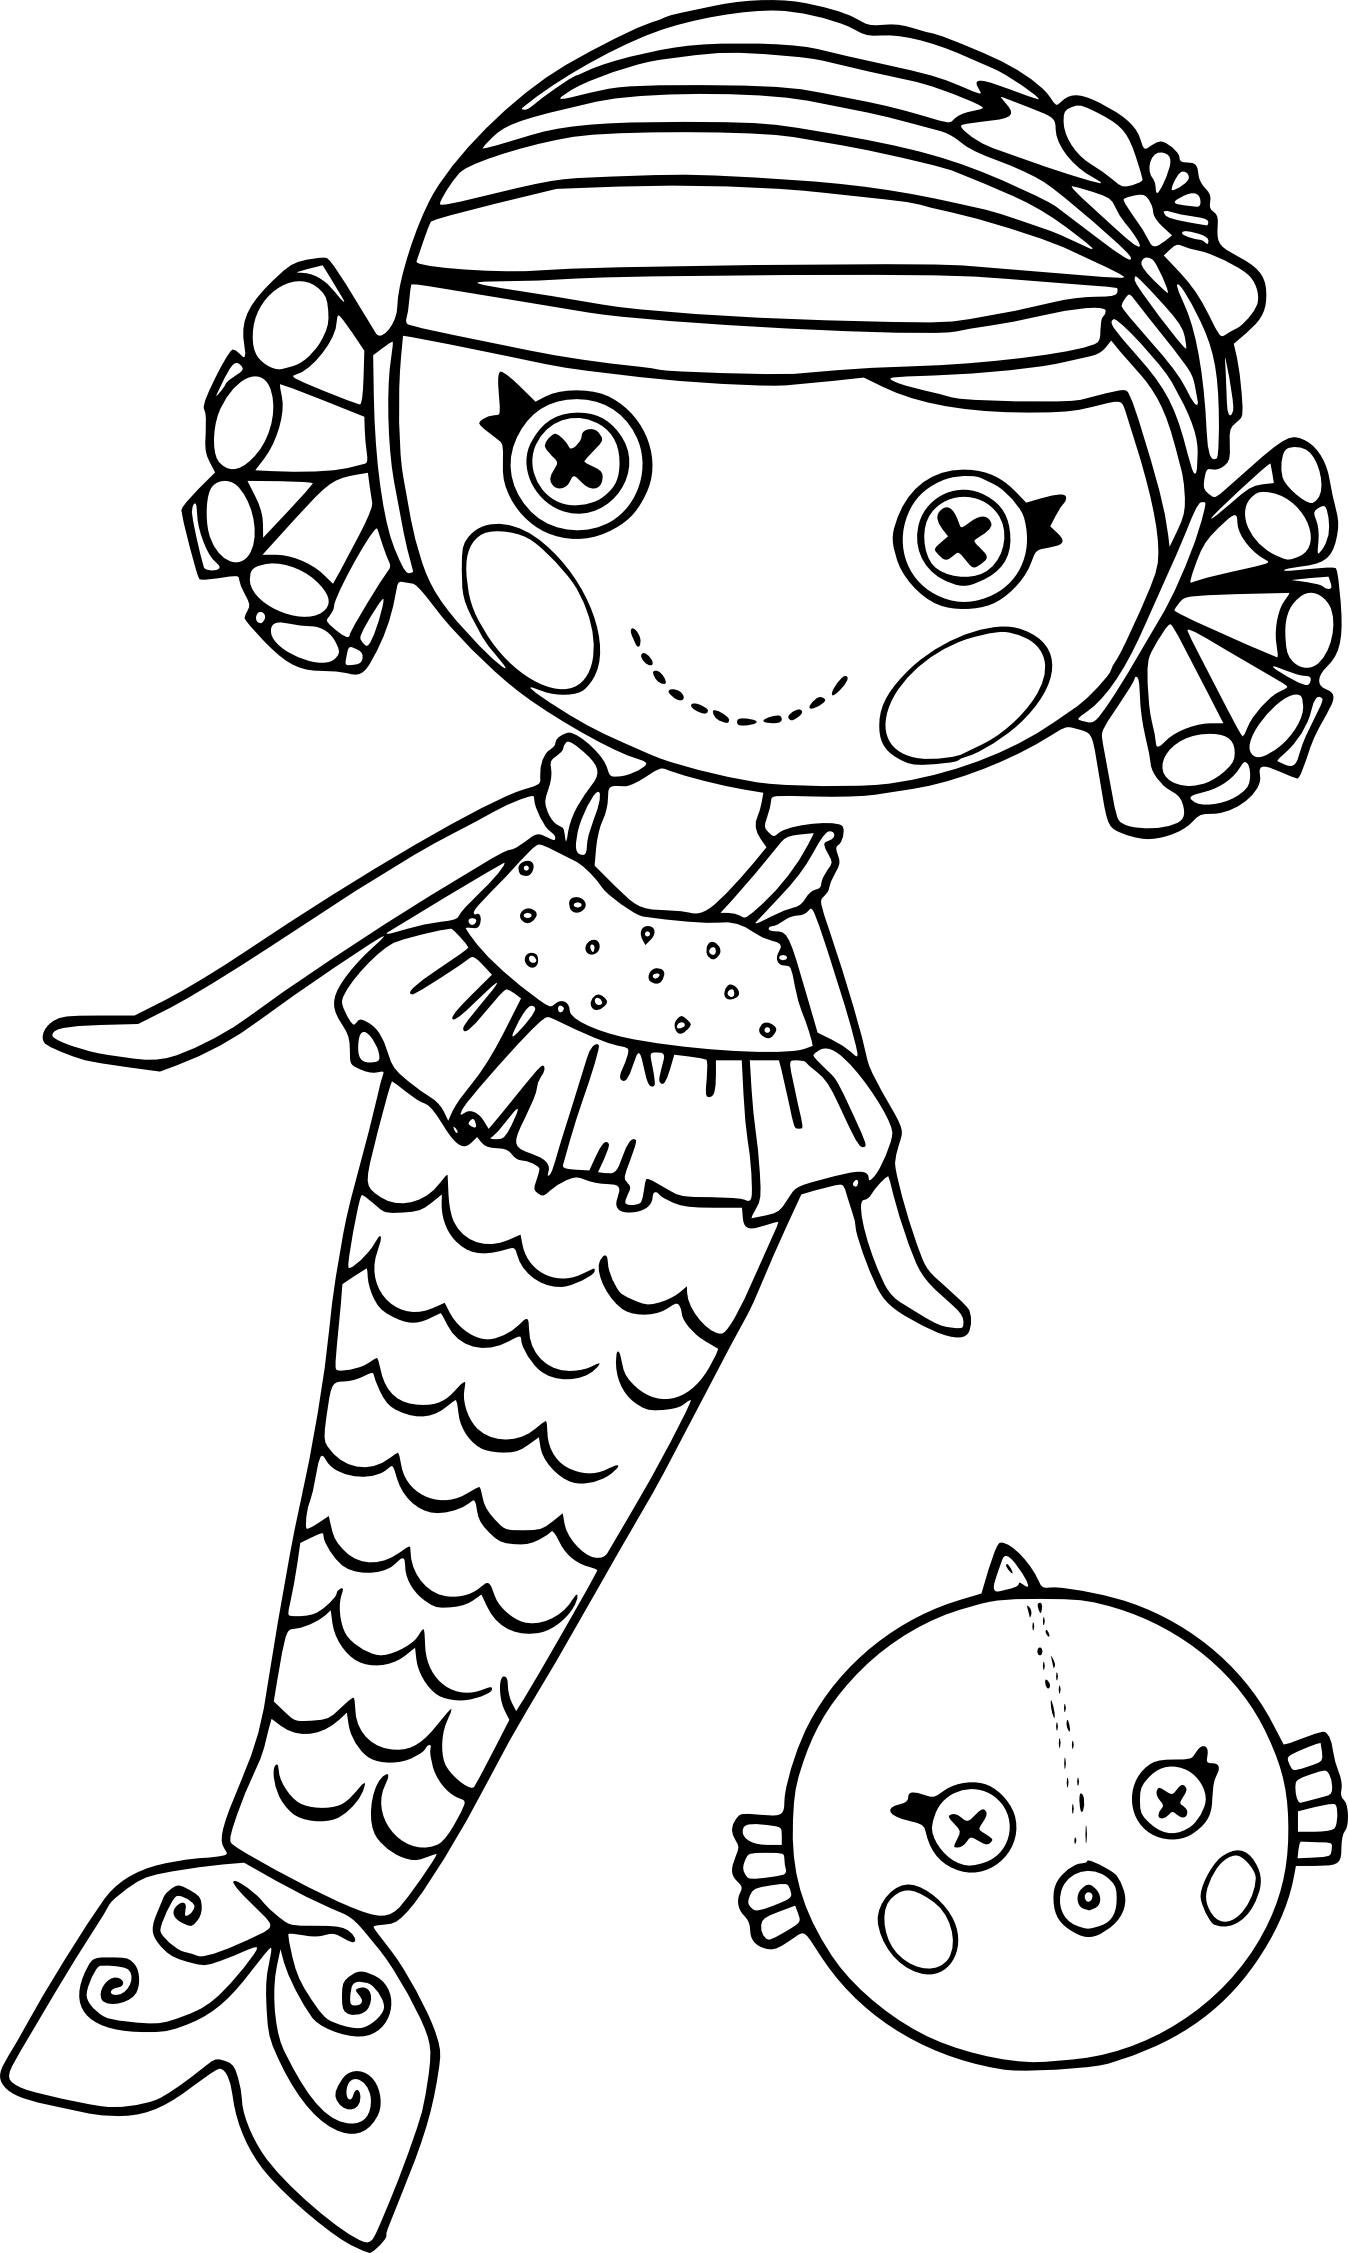 Coloriage lalaloopsy et dessin imprimer - Des dessins a imprimer ...